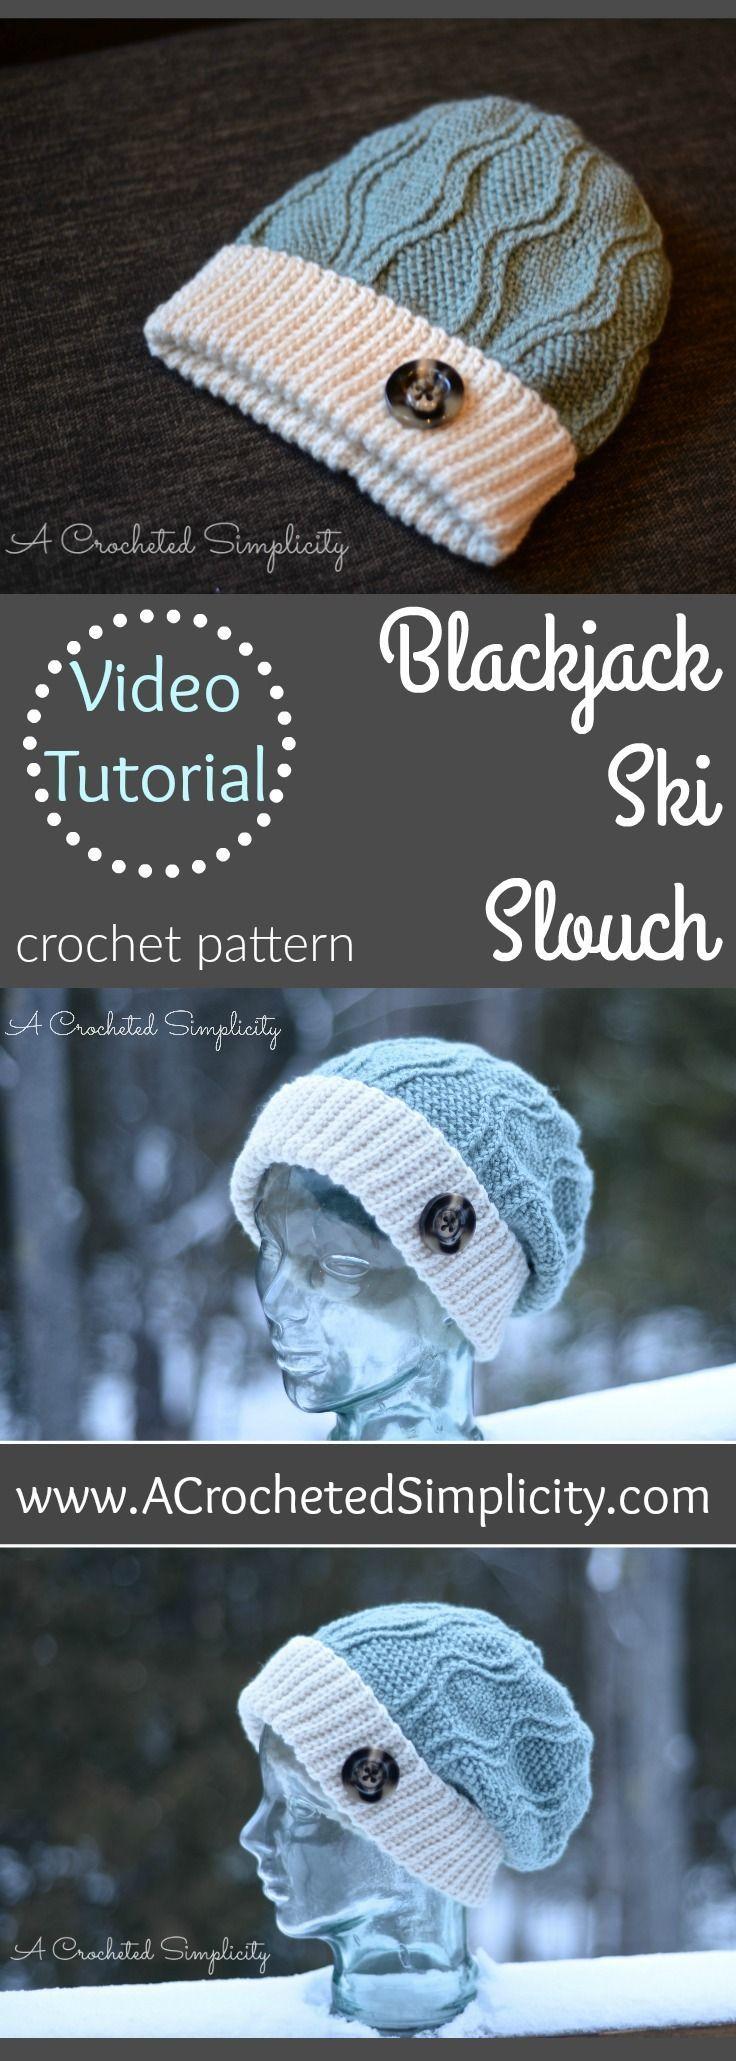 Crochet Pattern - Blackjack Ski Slouch w/ Video Tutorial by A Crocheted Simplicity